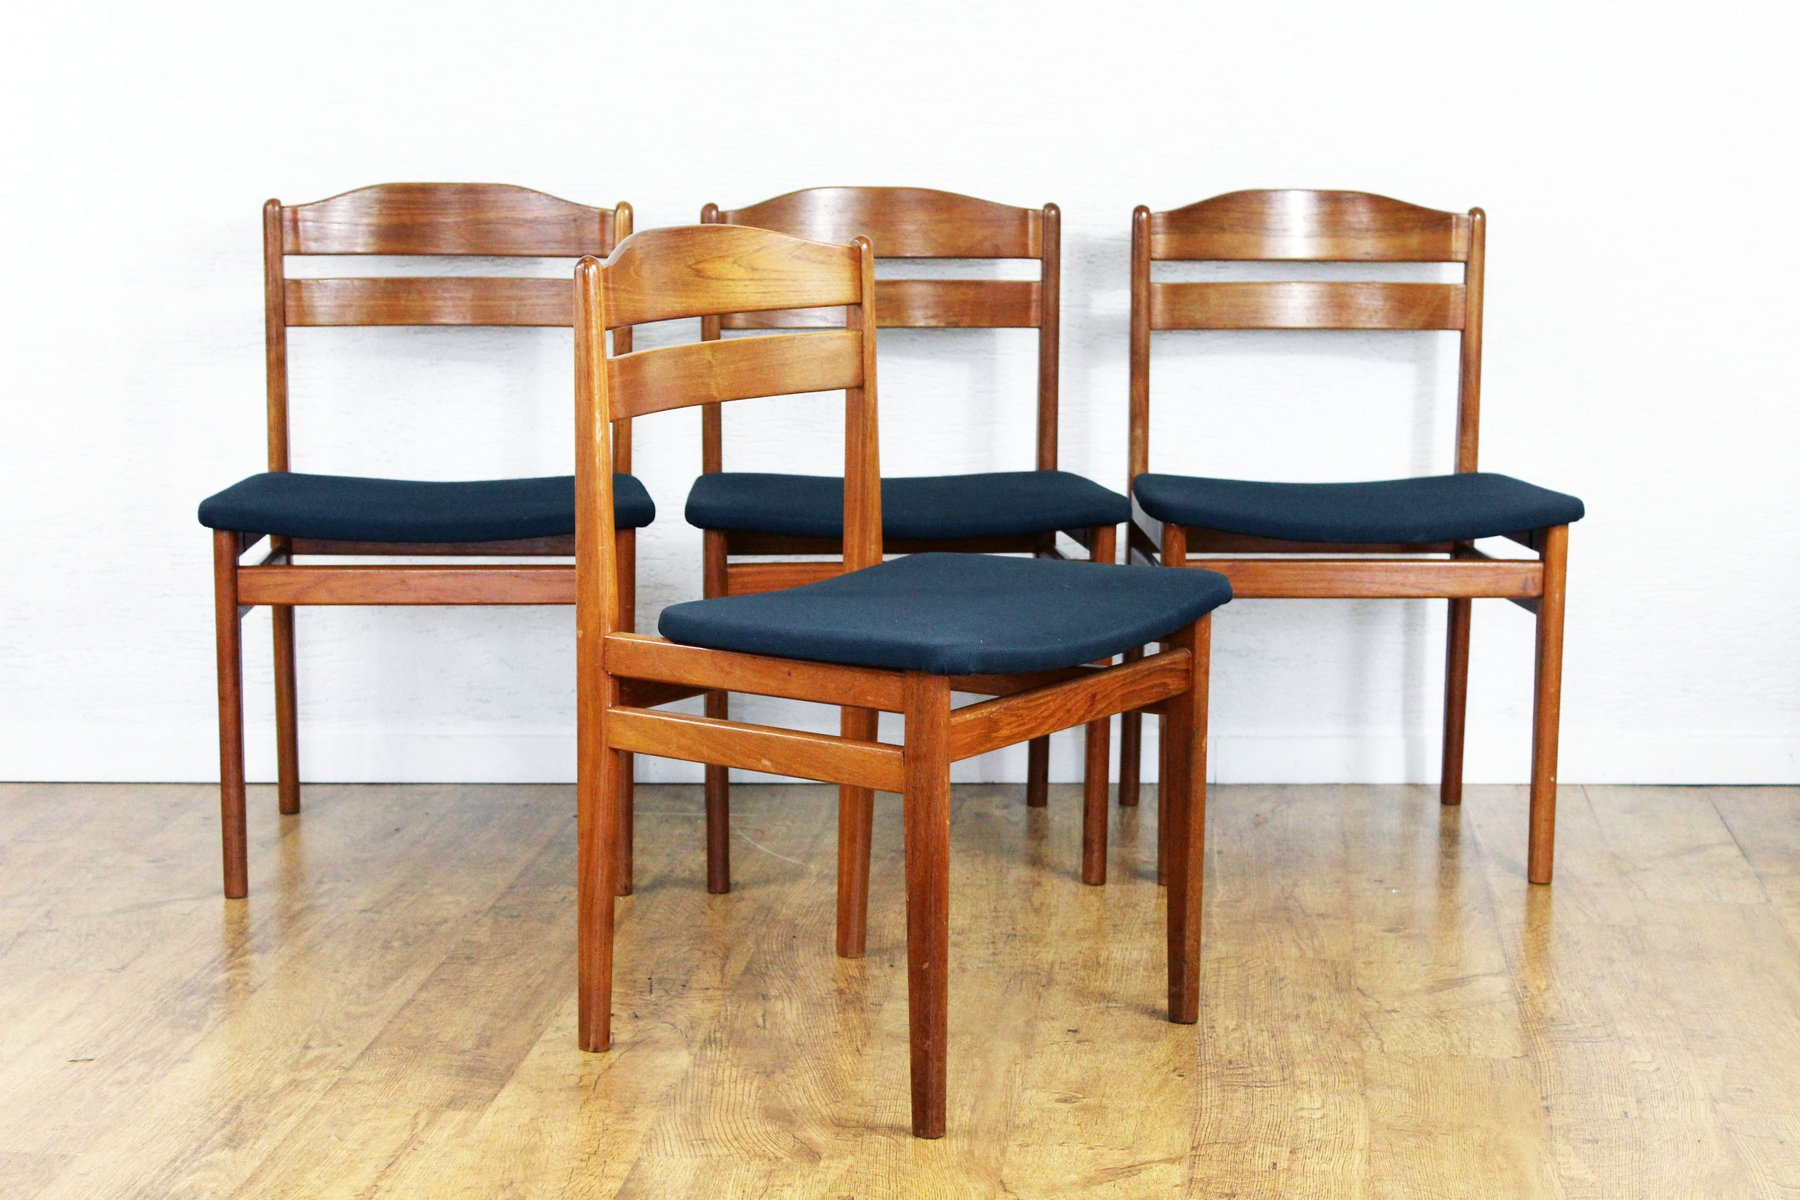 skandinavische mid century st hle 4er set bei pamono kaufen. Black Bedroom Furniture Sets. Home Design Ideas